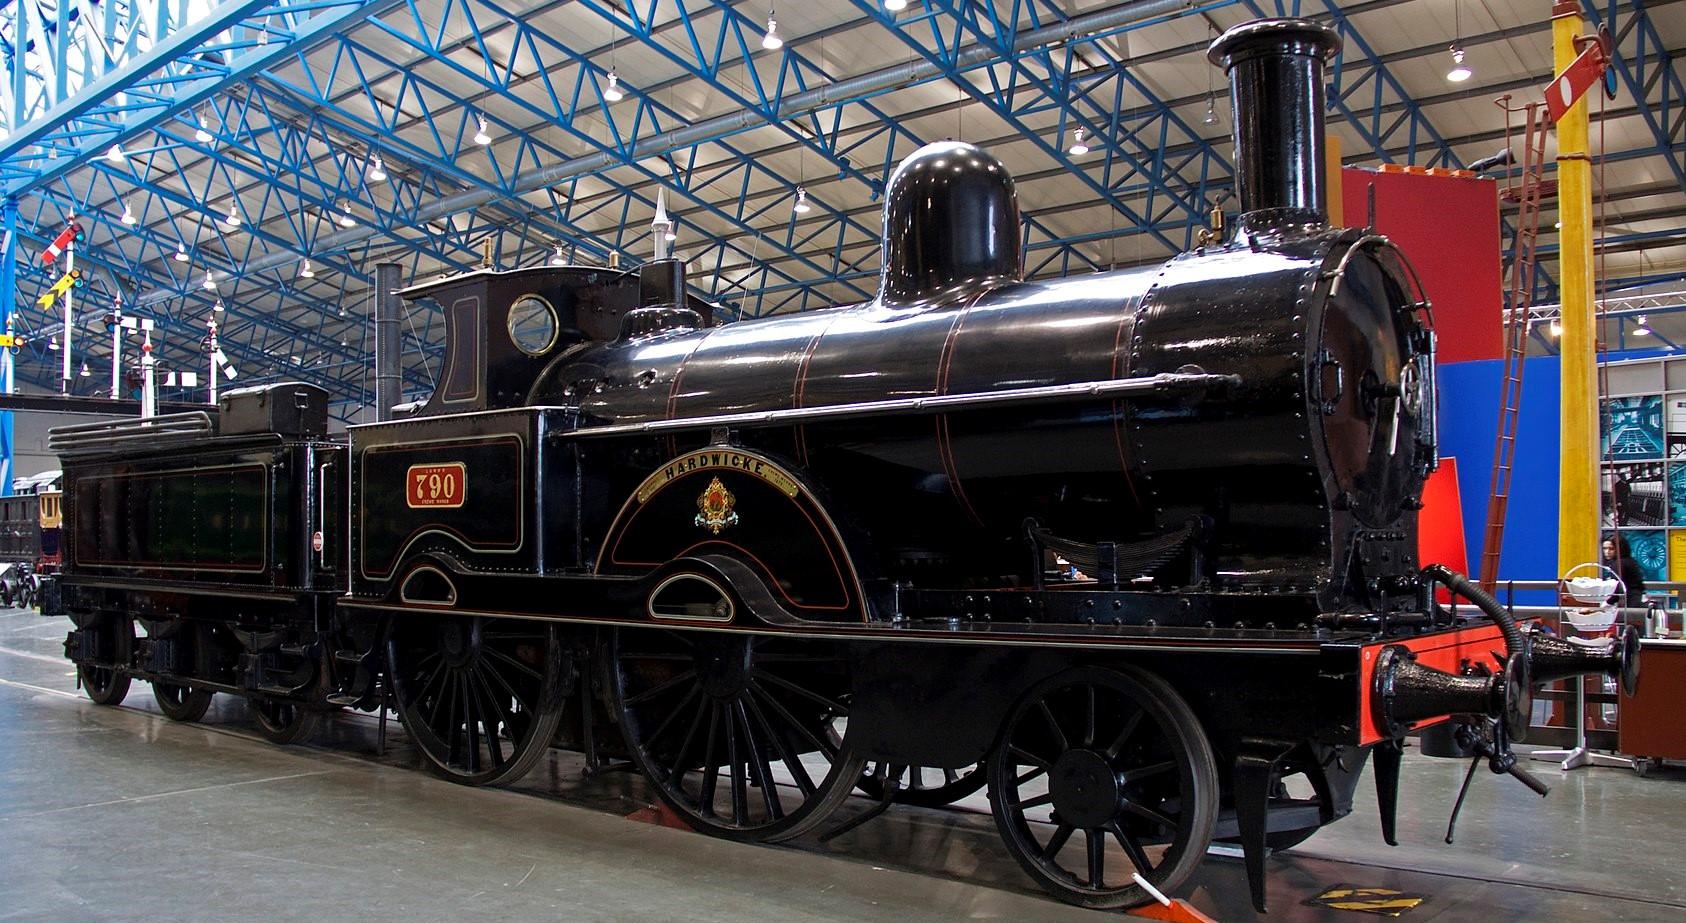 790 'Hardwicke' at the National Railway Museum, York in February 2011. ©Tony Hisgett